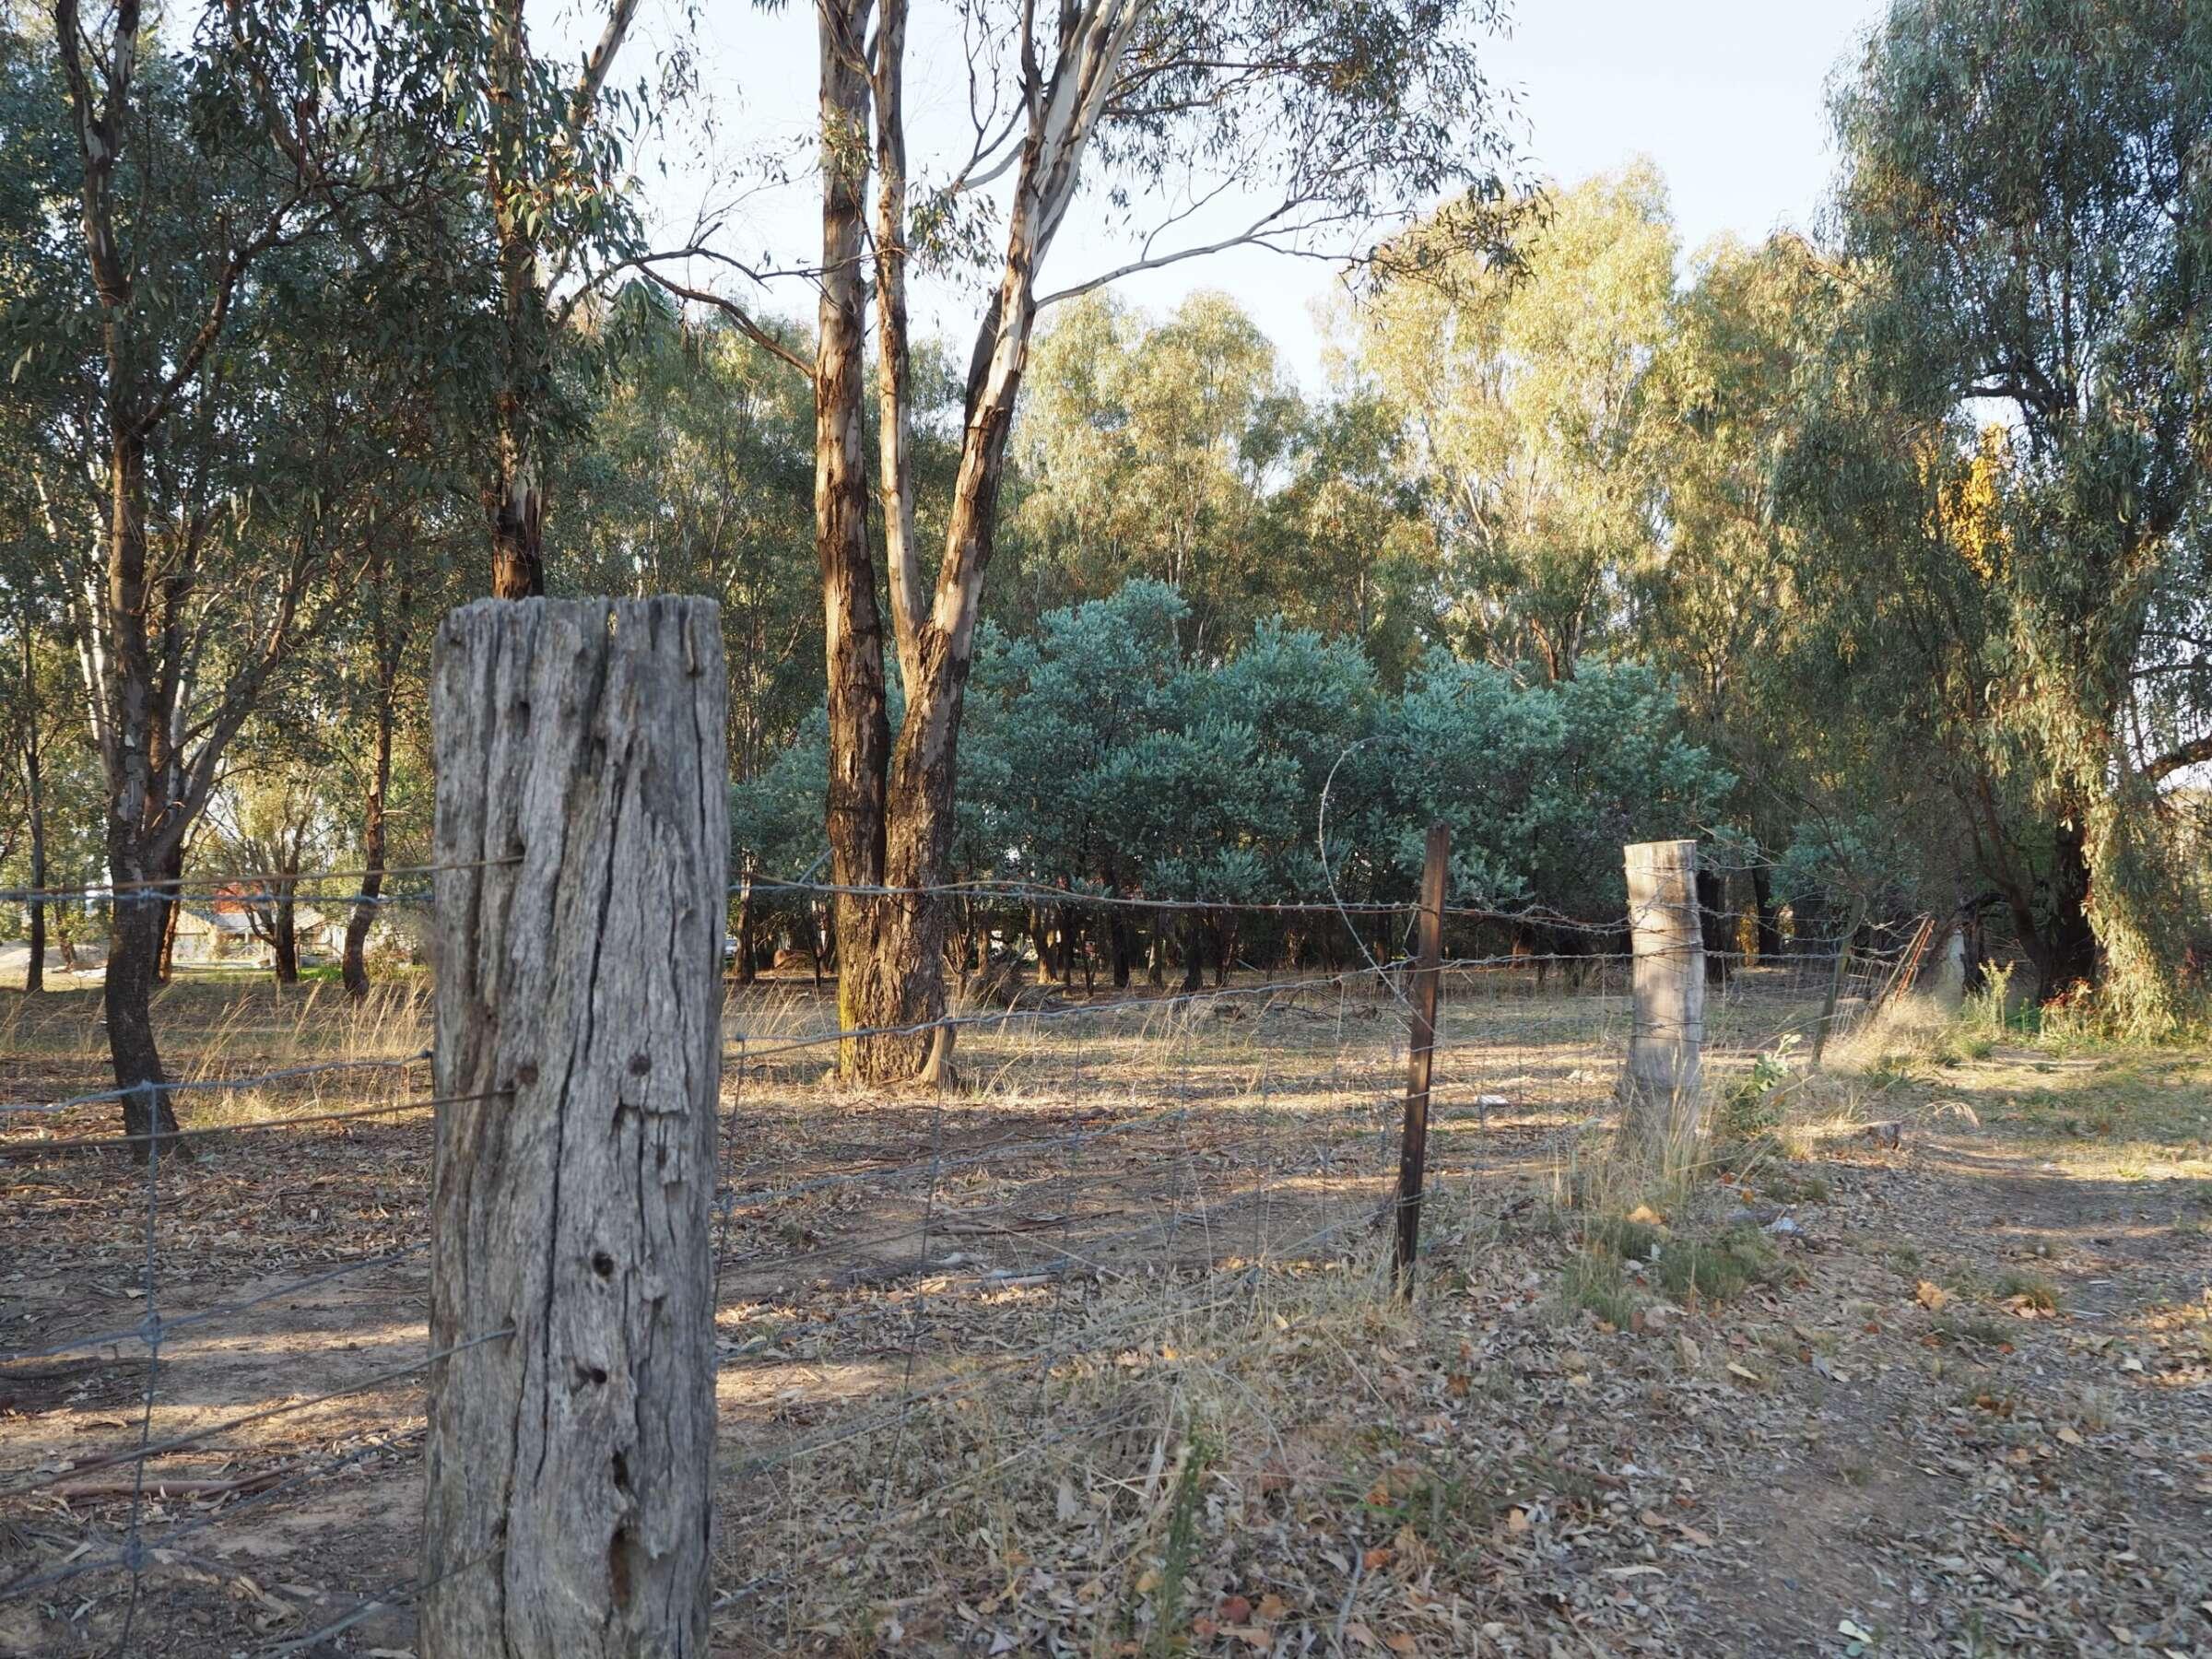 Fenced area of roadside vegetation